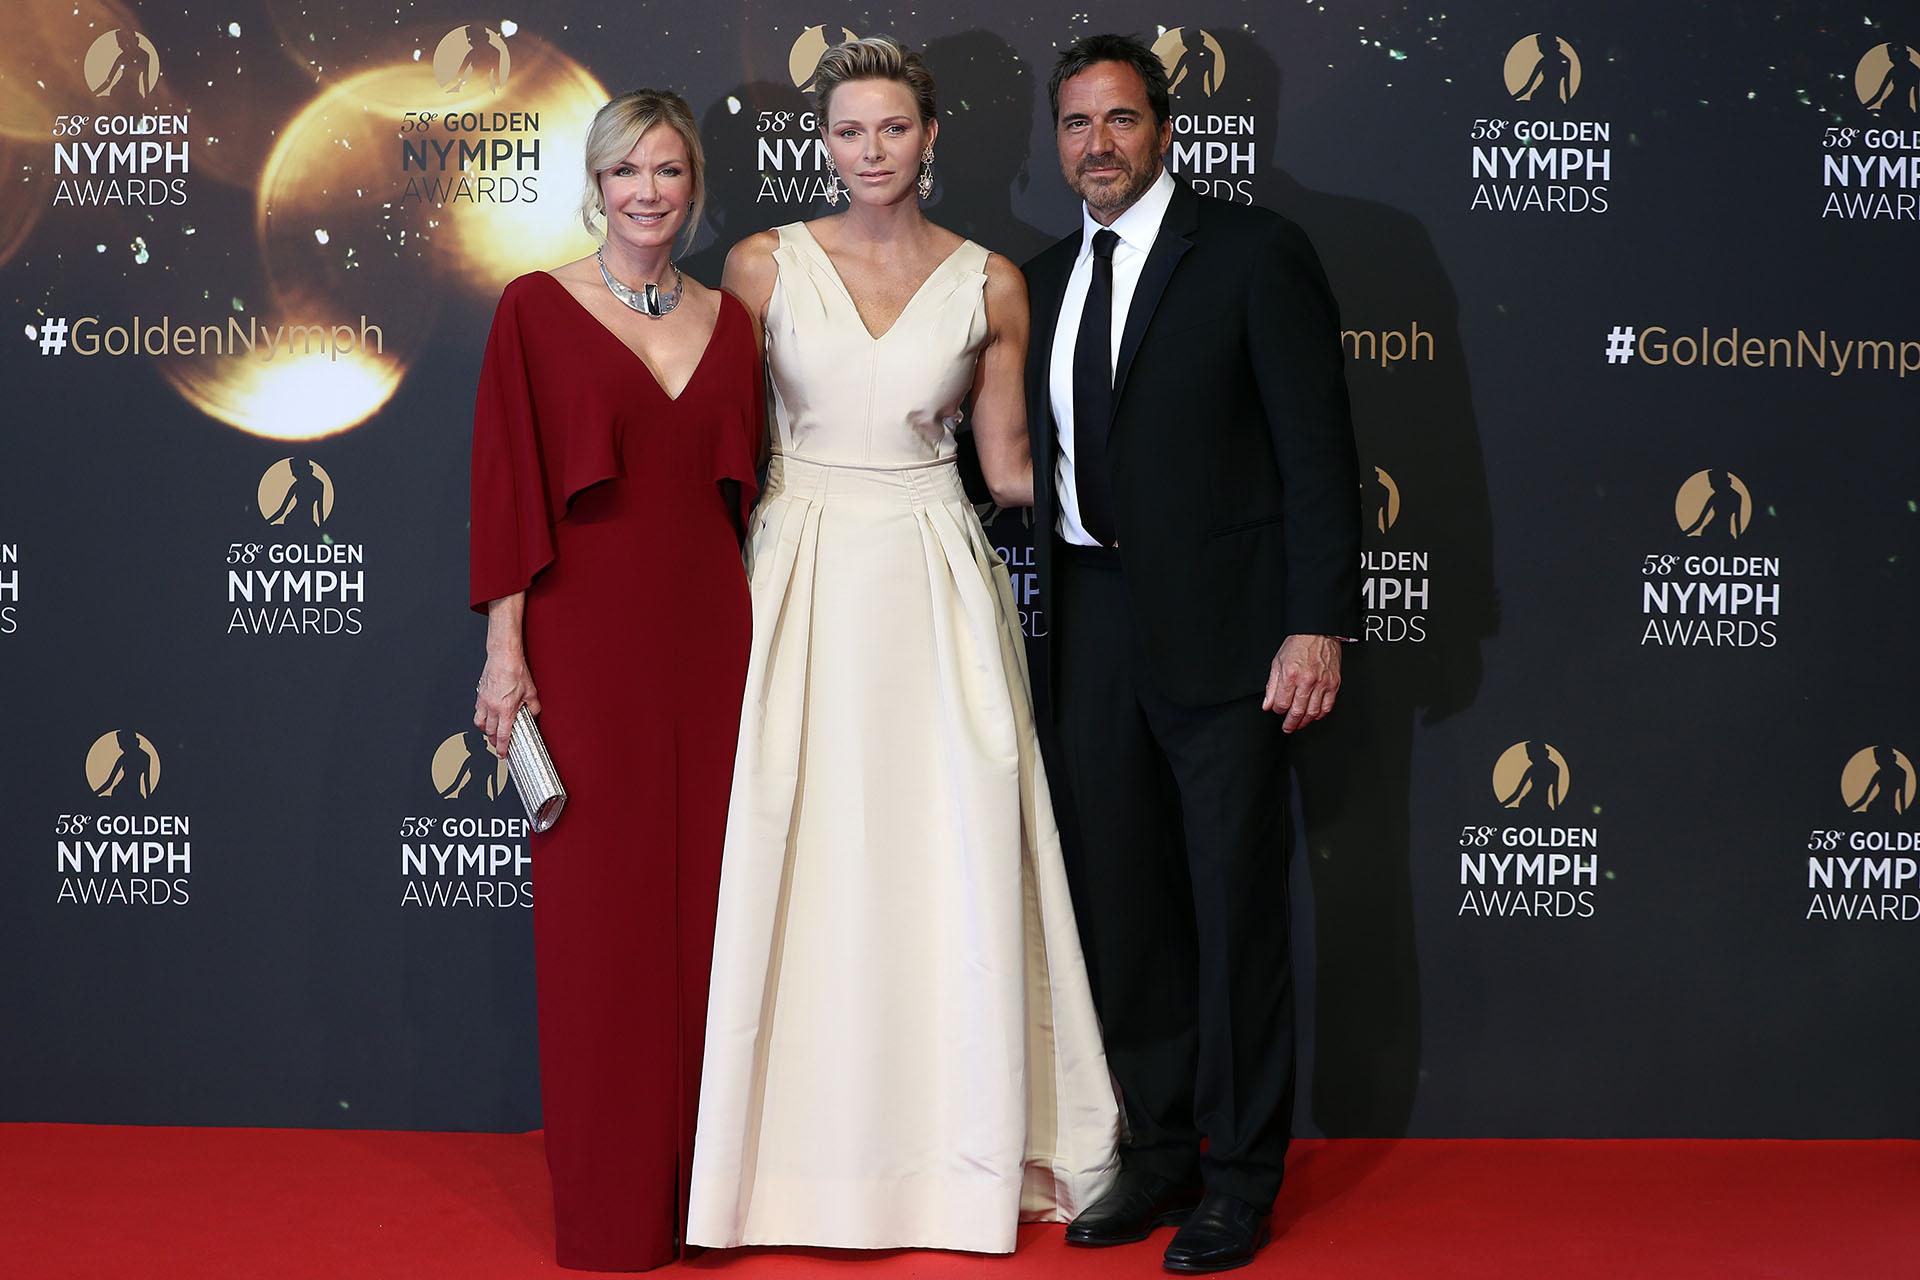 Charlene en la alfombra roja junto a Katherine Kelly Lang y Thorsten Kaye